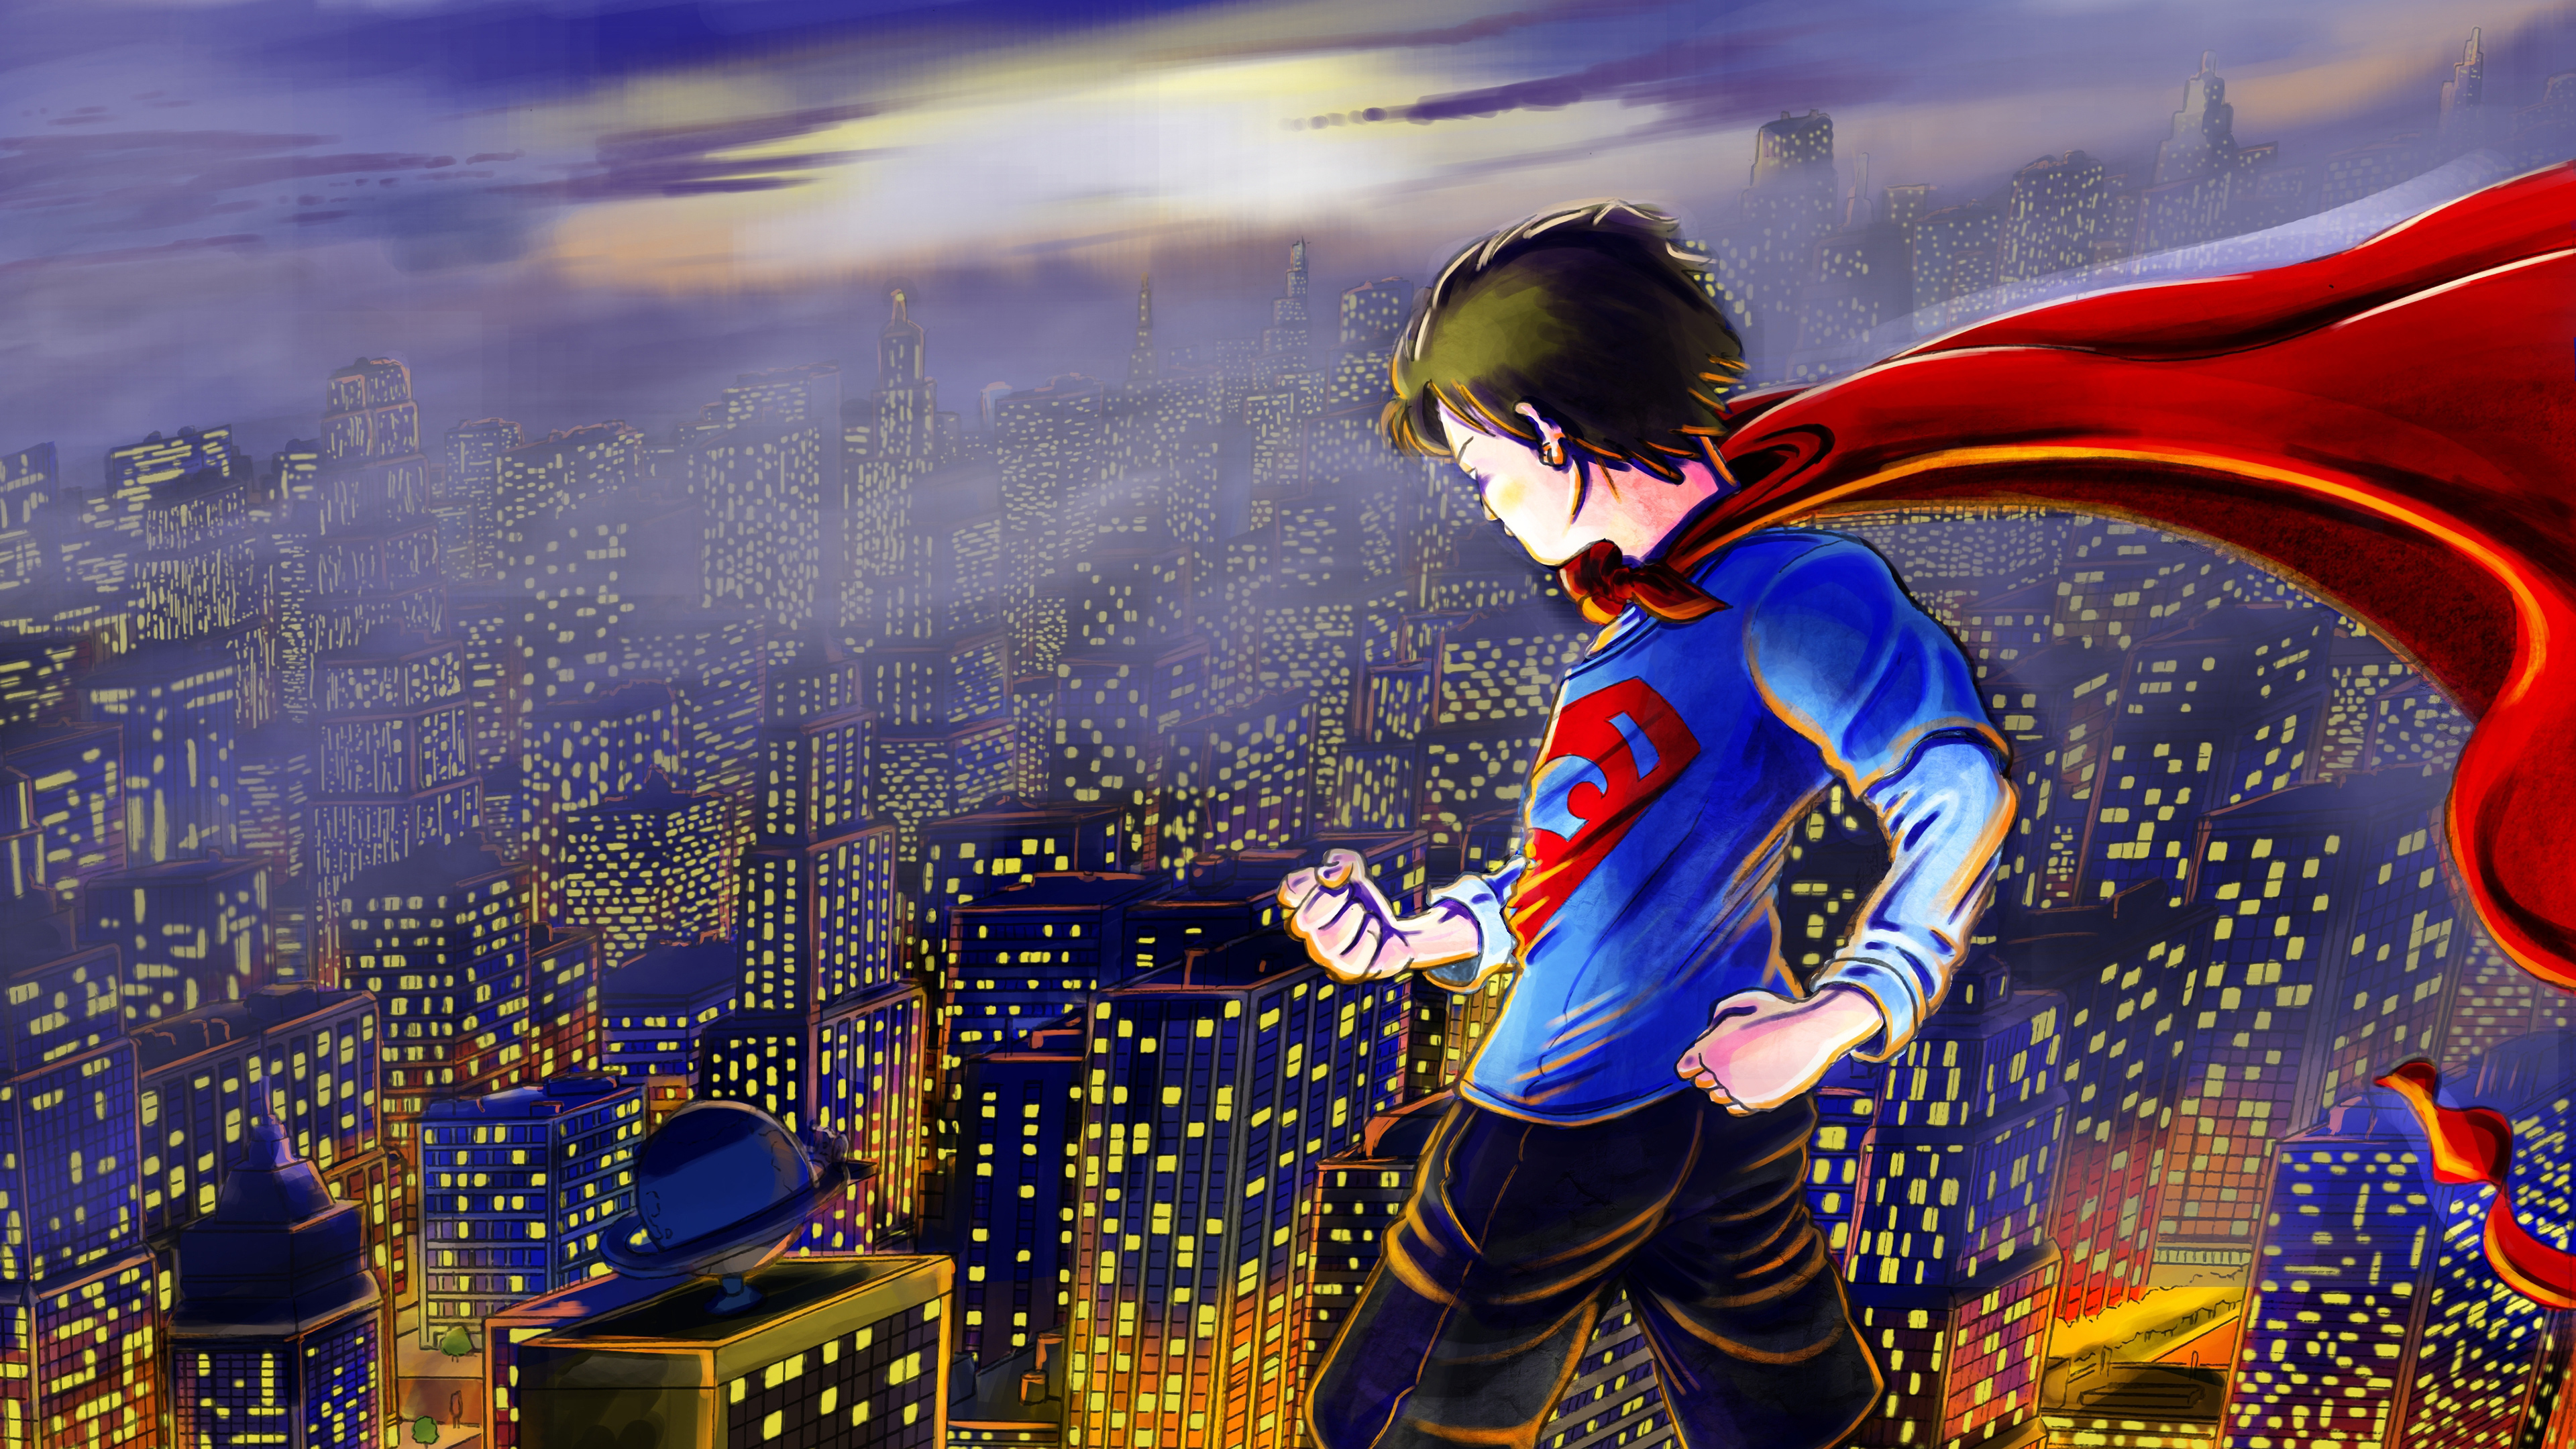 kid superman art 4k 1544286914 - Kid Superman art 4k - superman wallpapers, superheroes wallpapers, hd-wallpapers, digital art wallpapers, behance wallpapers, artwork wallpapers, 4k-wallpapers